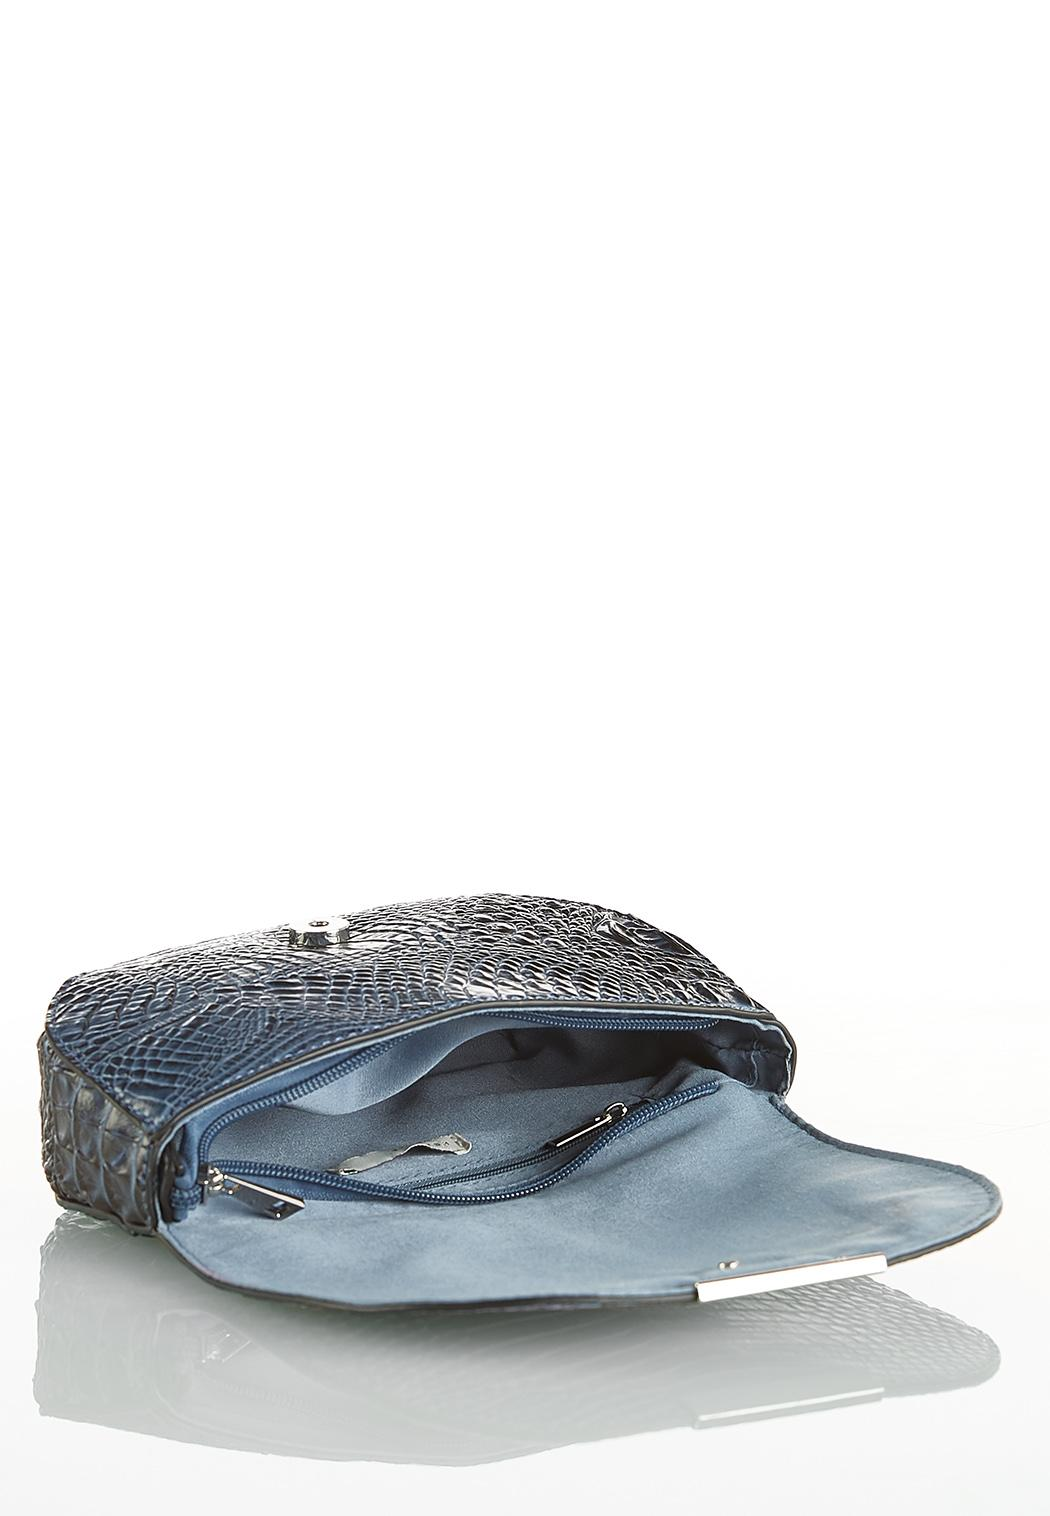 Blue Gray Croc Wristlet (Item #44108639)